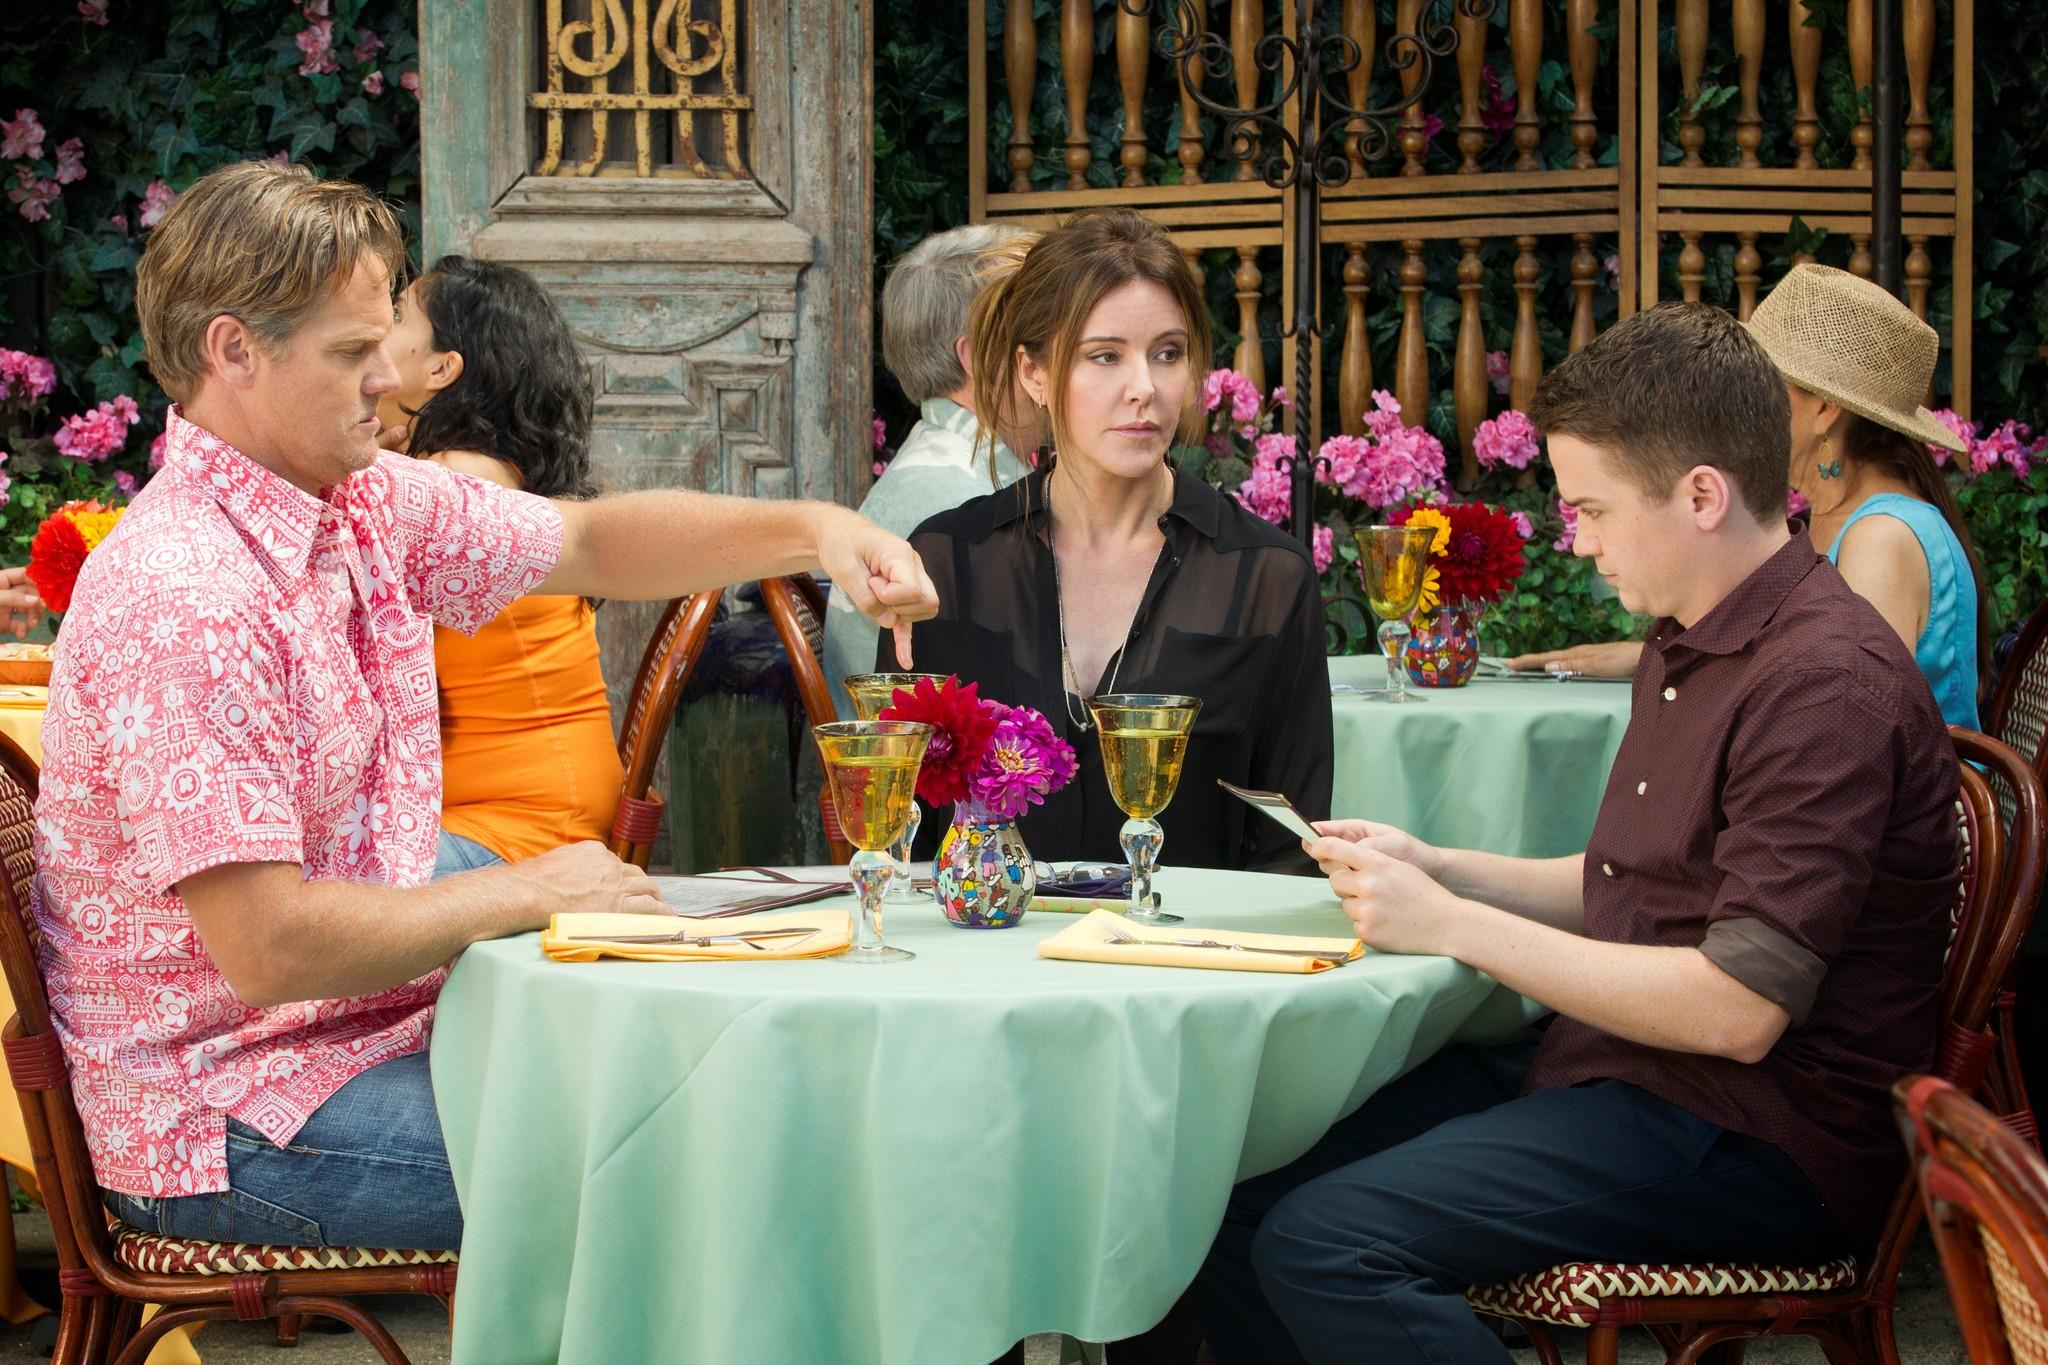 Still of Dan Byrd, Christa Miller and Brian Van Holt in Cougar Town (2009)